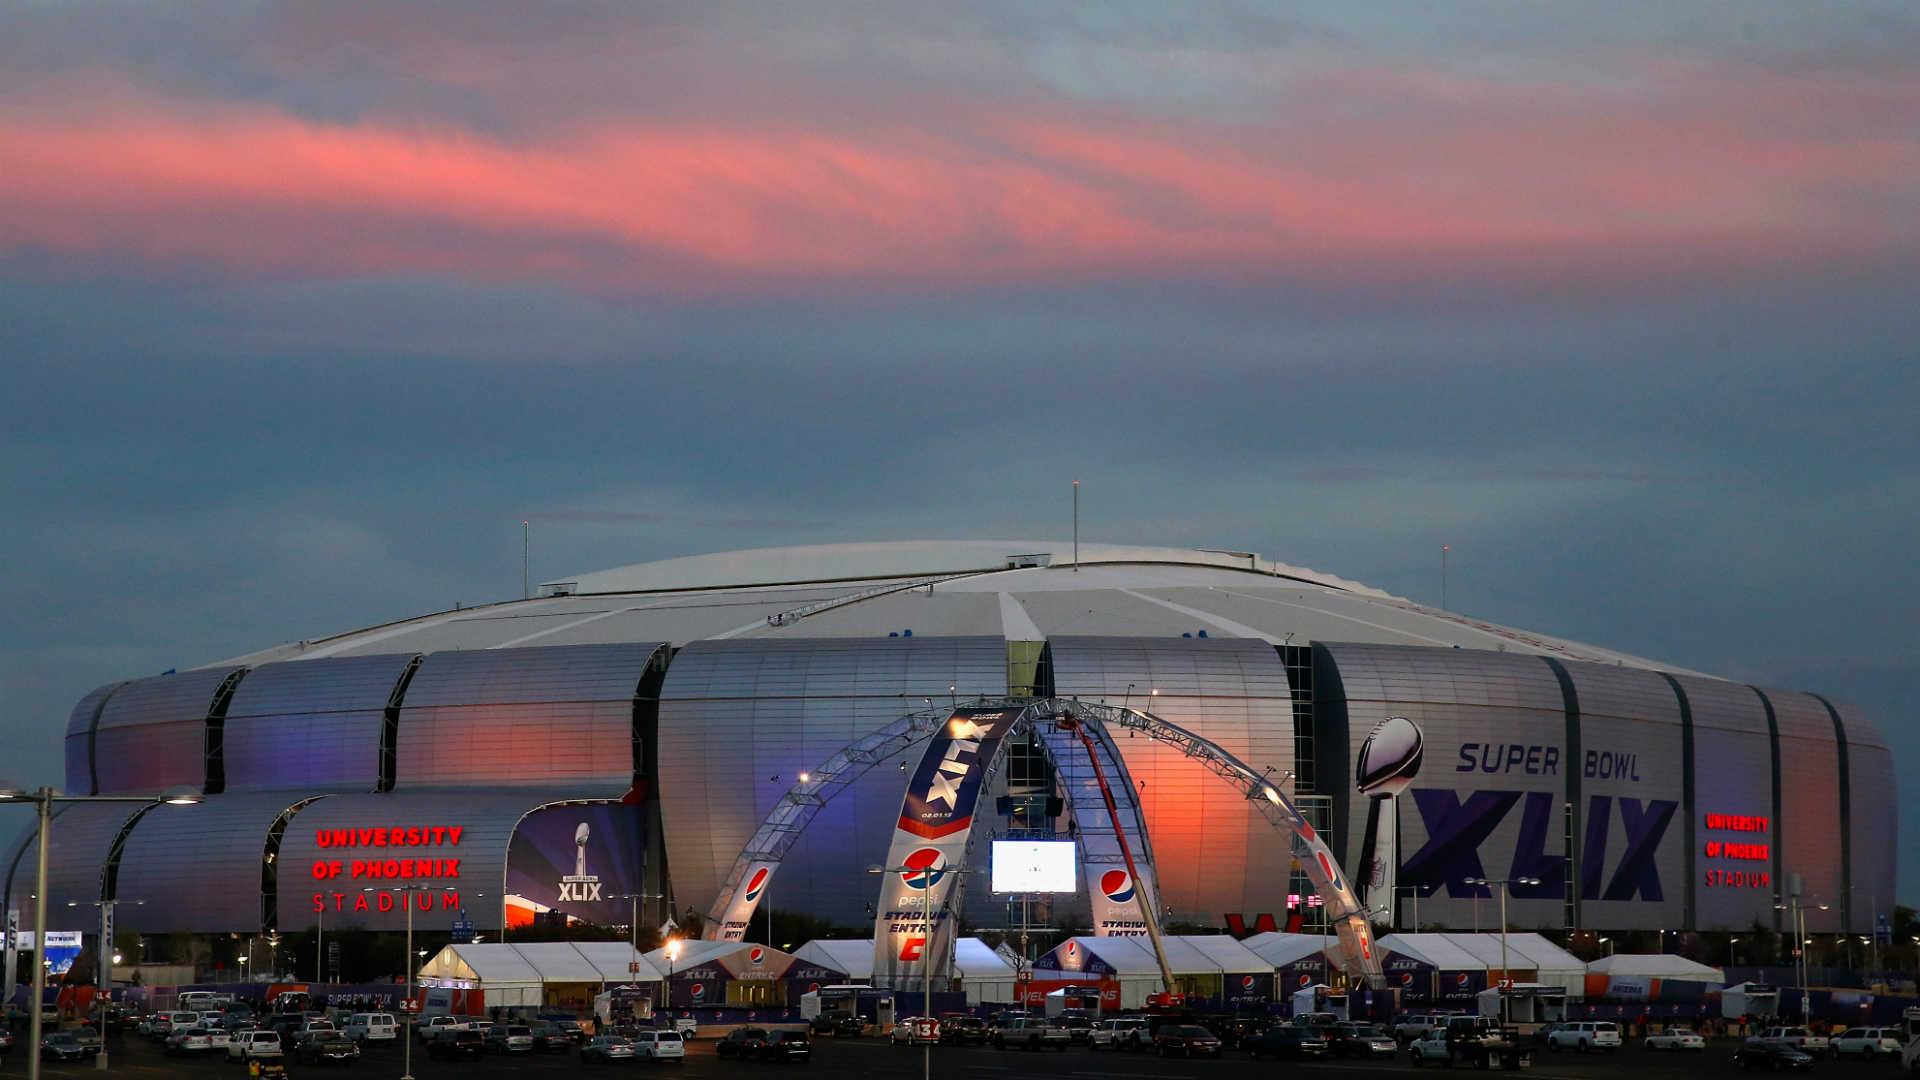 Super-Bowl-stadium-020115-Getty-FTR.jpg